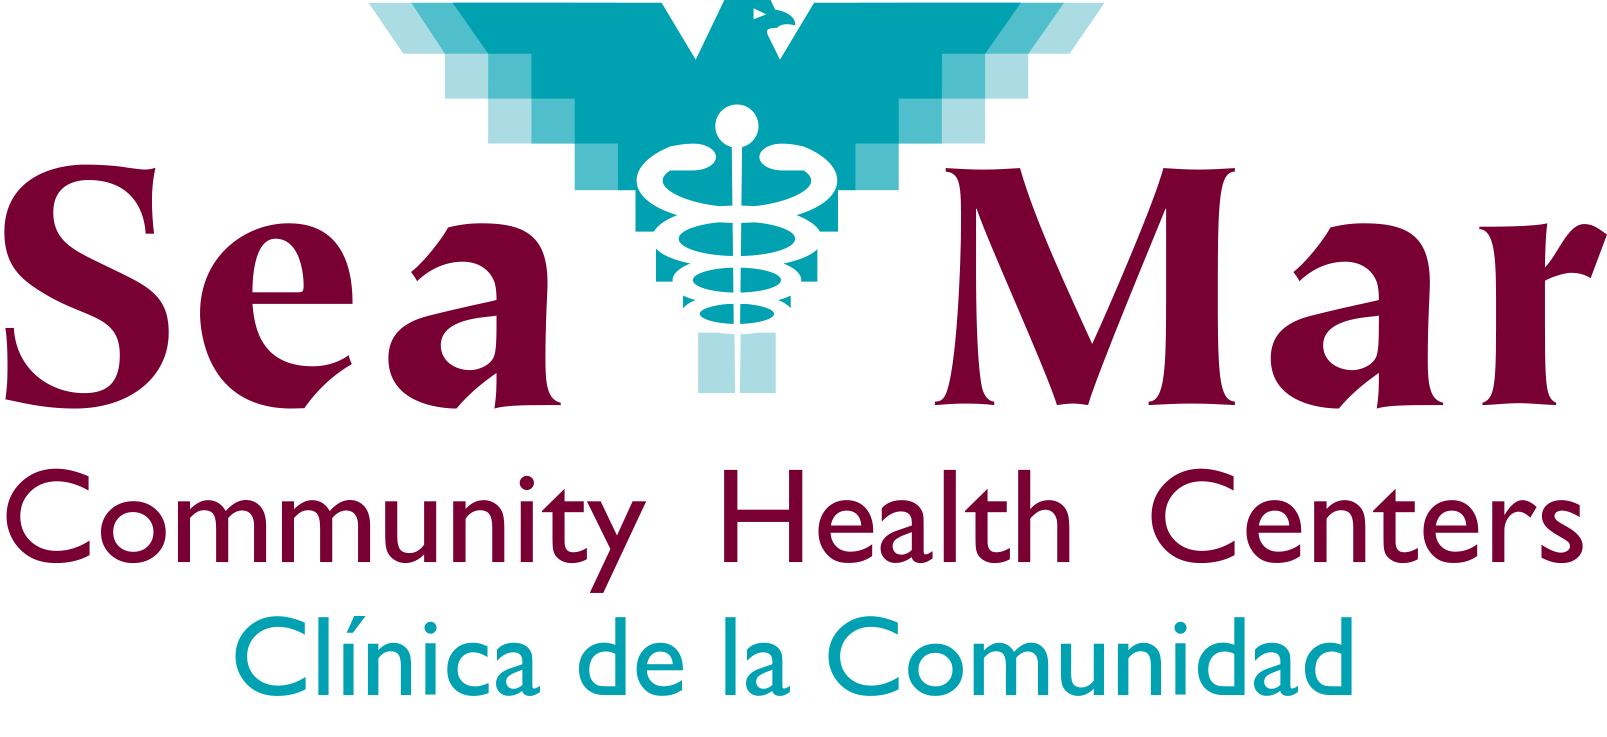 Sea Mar Community Health Care Centers - 244447222.jpg